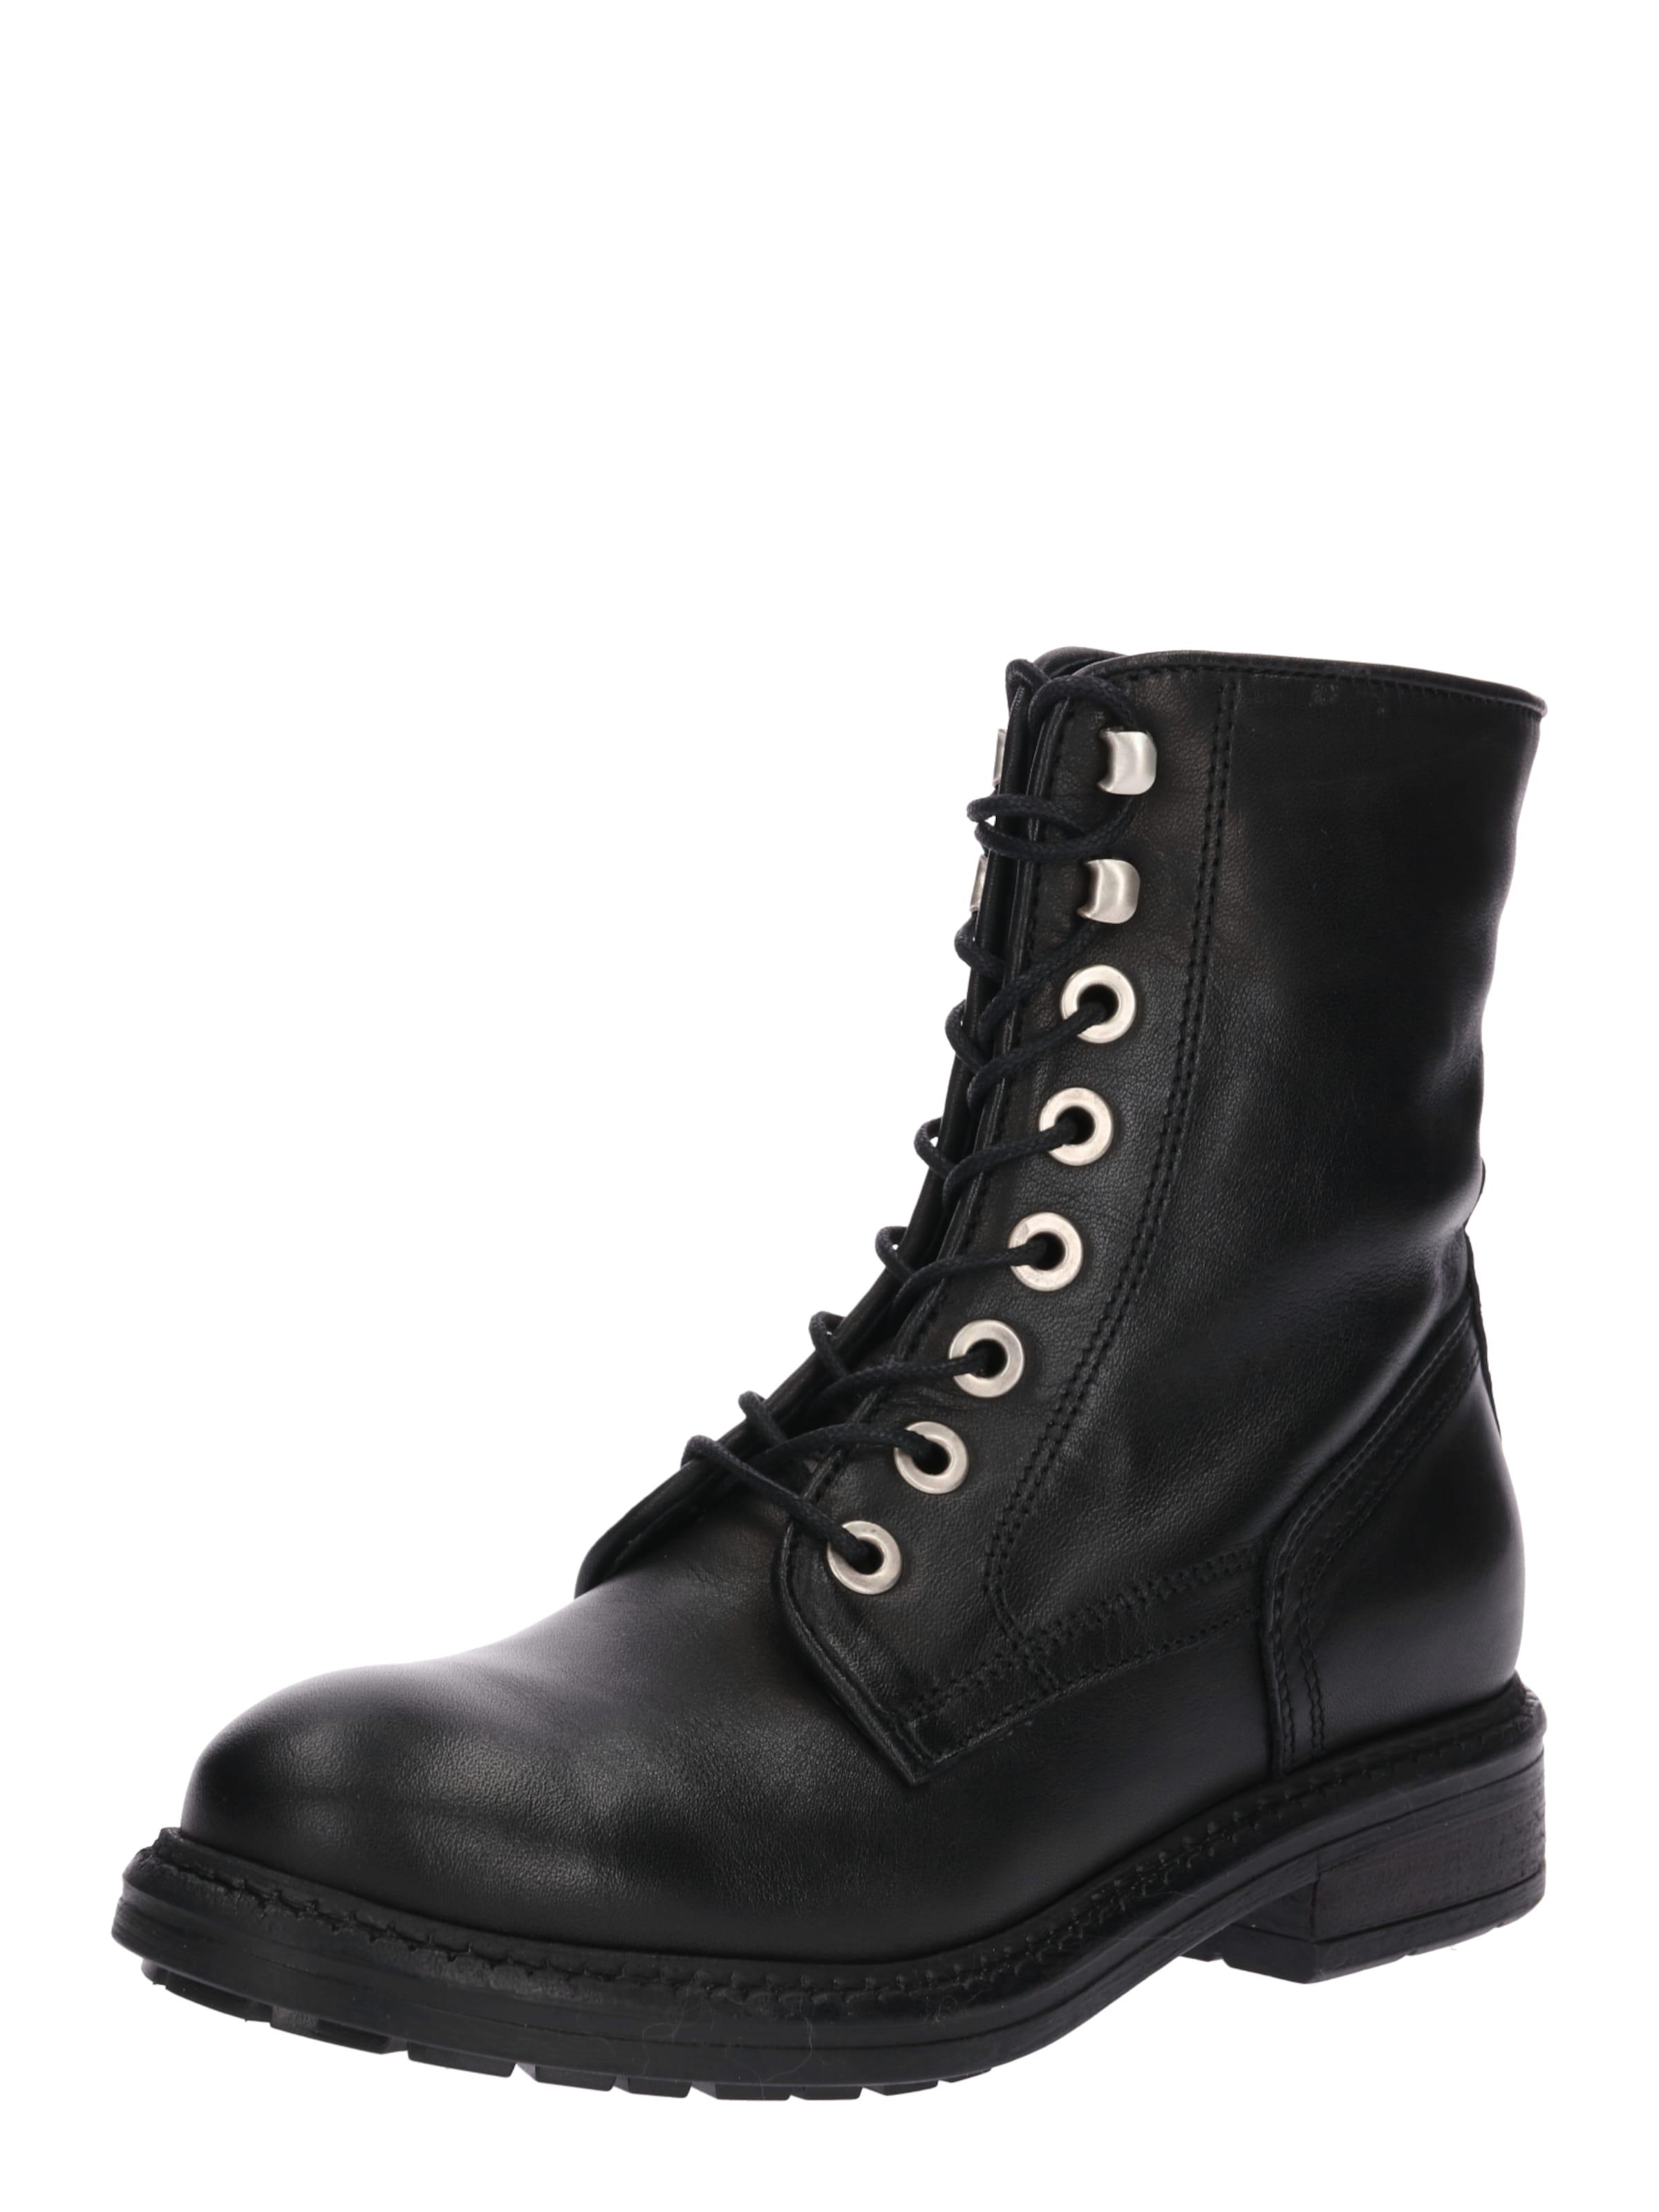 Zign Boots  IB 506W